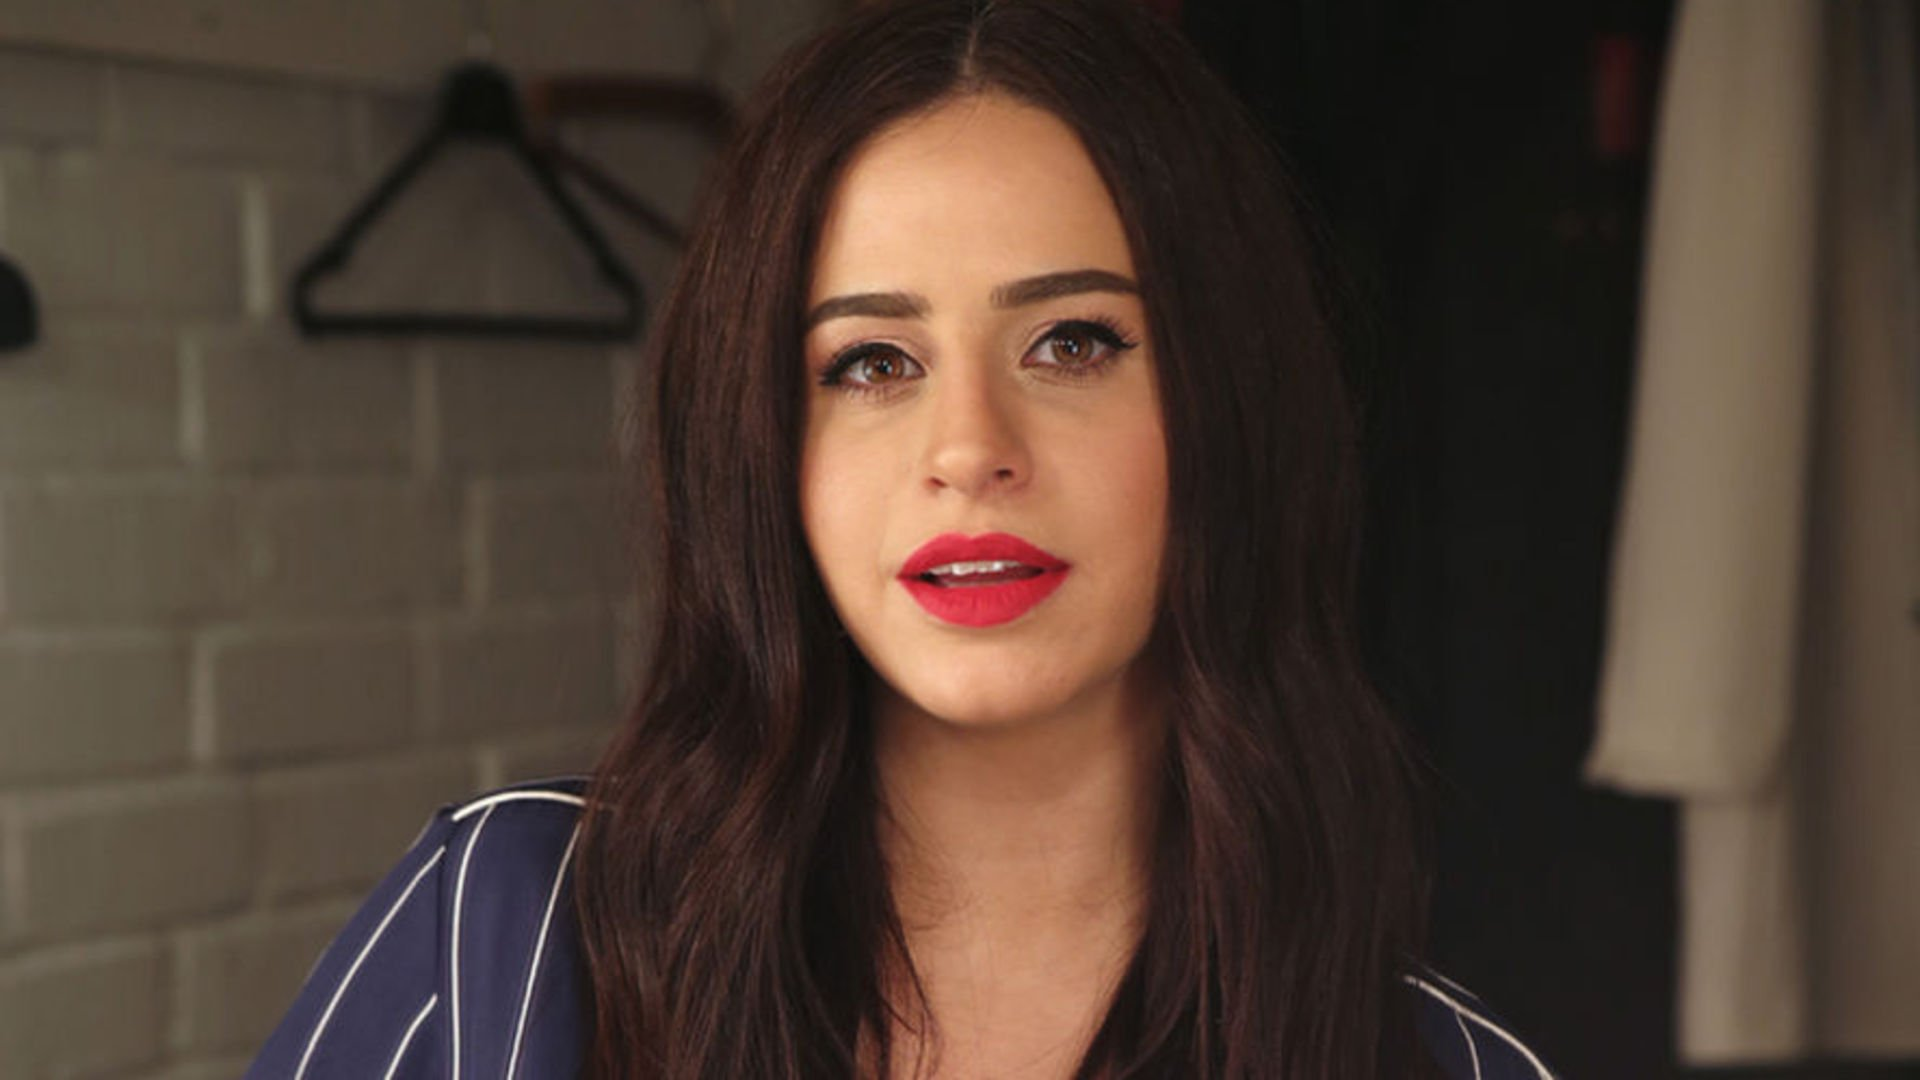 'Küçük Dev Kadın Dilber Ay'dan ilk tanıtım videosu